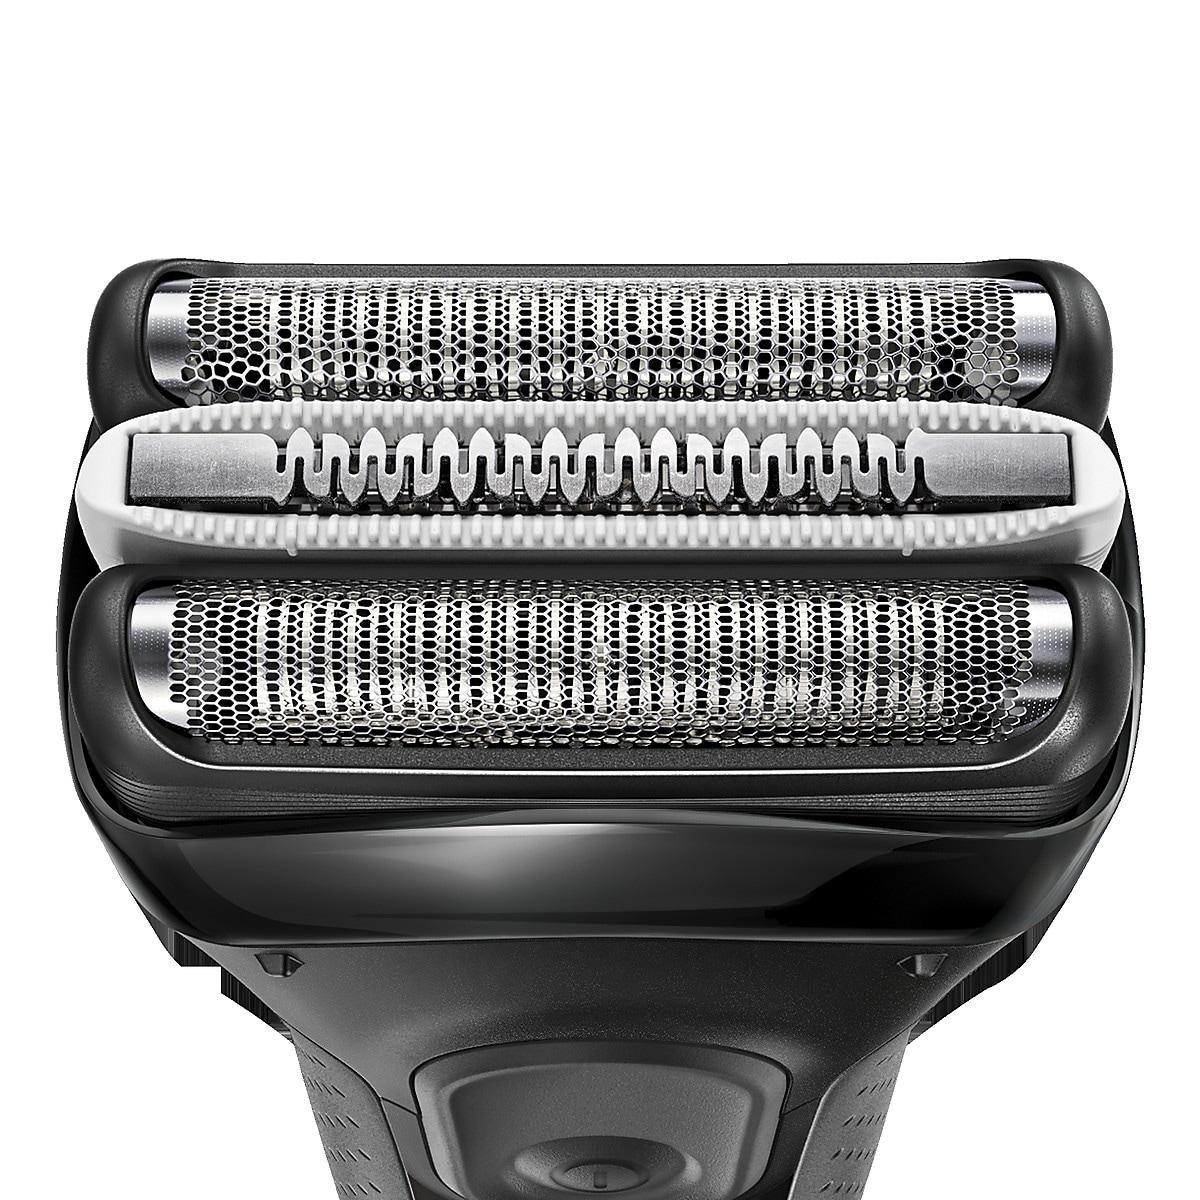 Rakapparat Braun 3050 CC Series 3